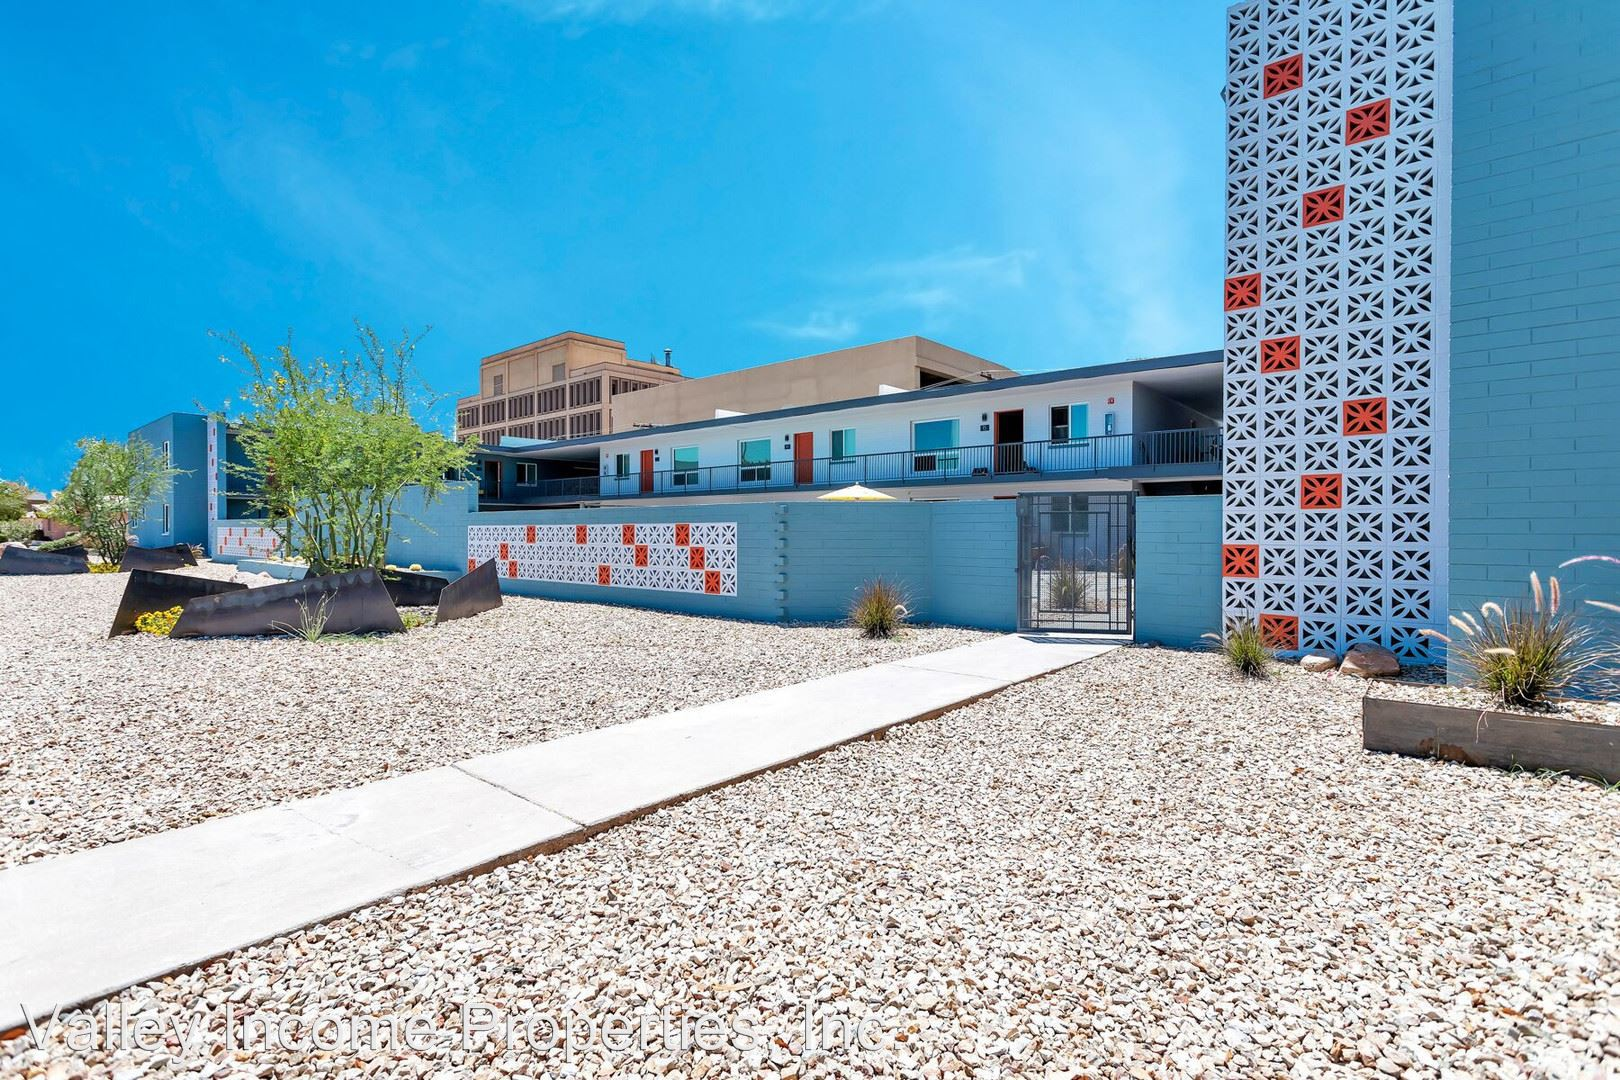 Tana Lea Apartments for rent